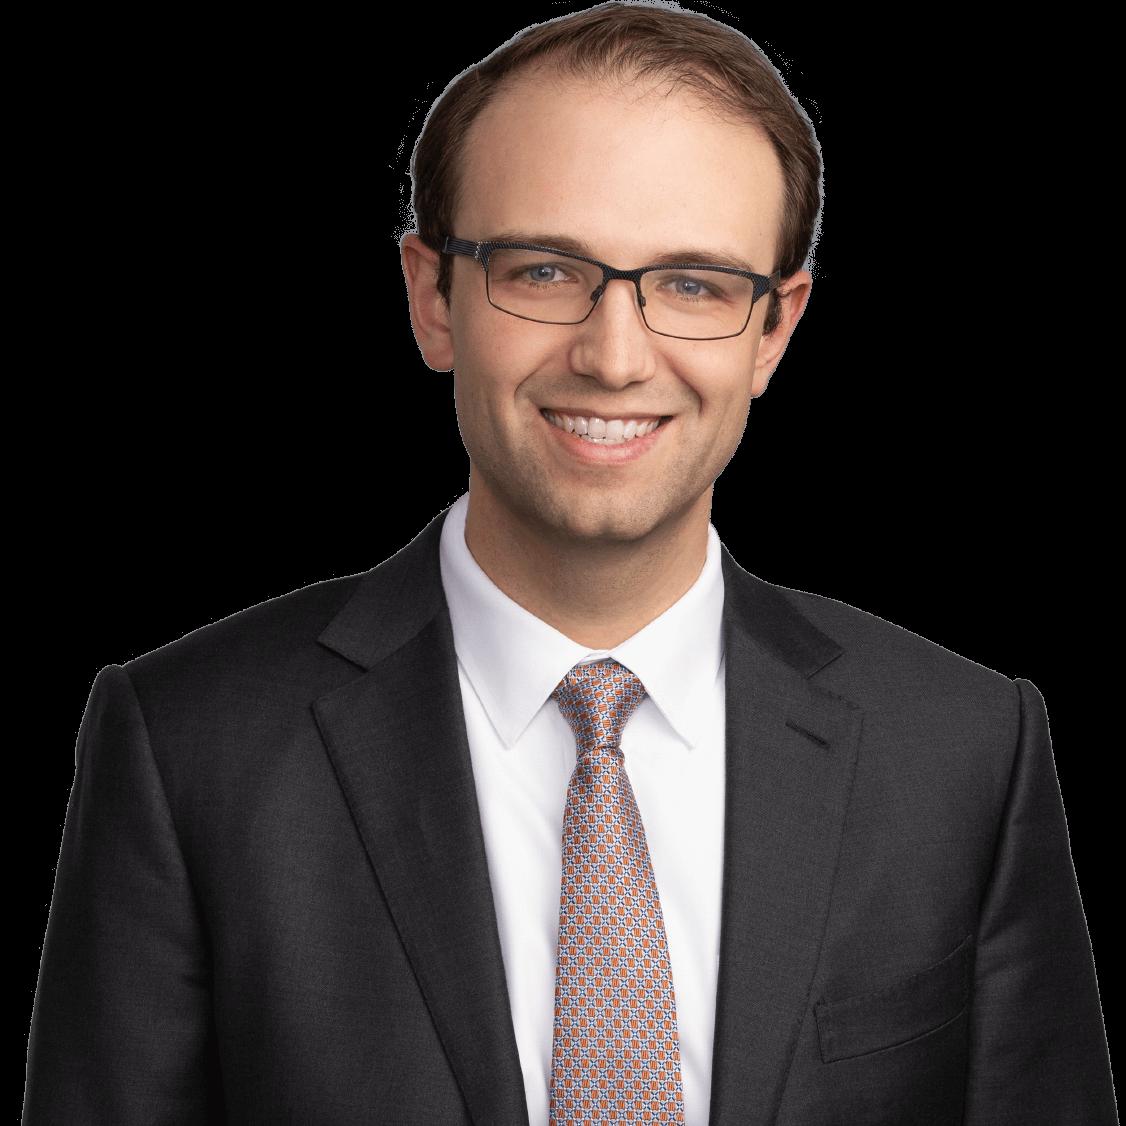 Zachary M. Schmitz